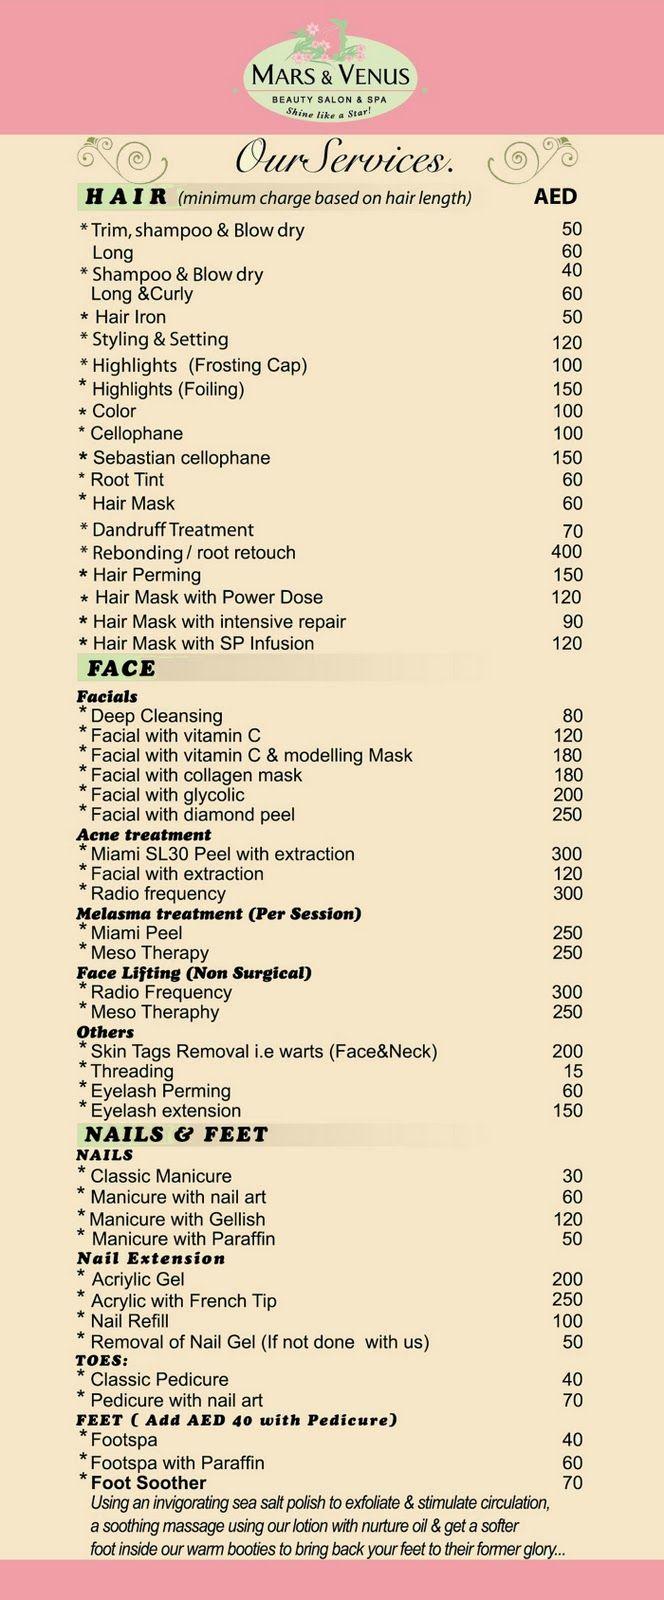 Filipino In Uae Mars Venus Beauty Salon Spa Brochure